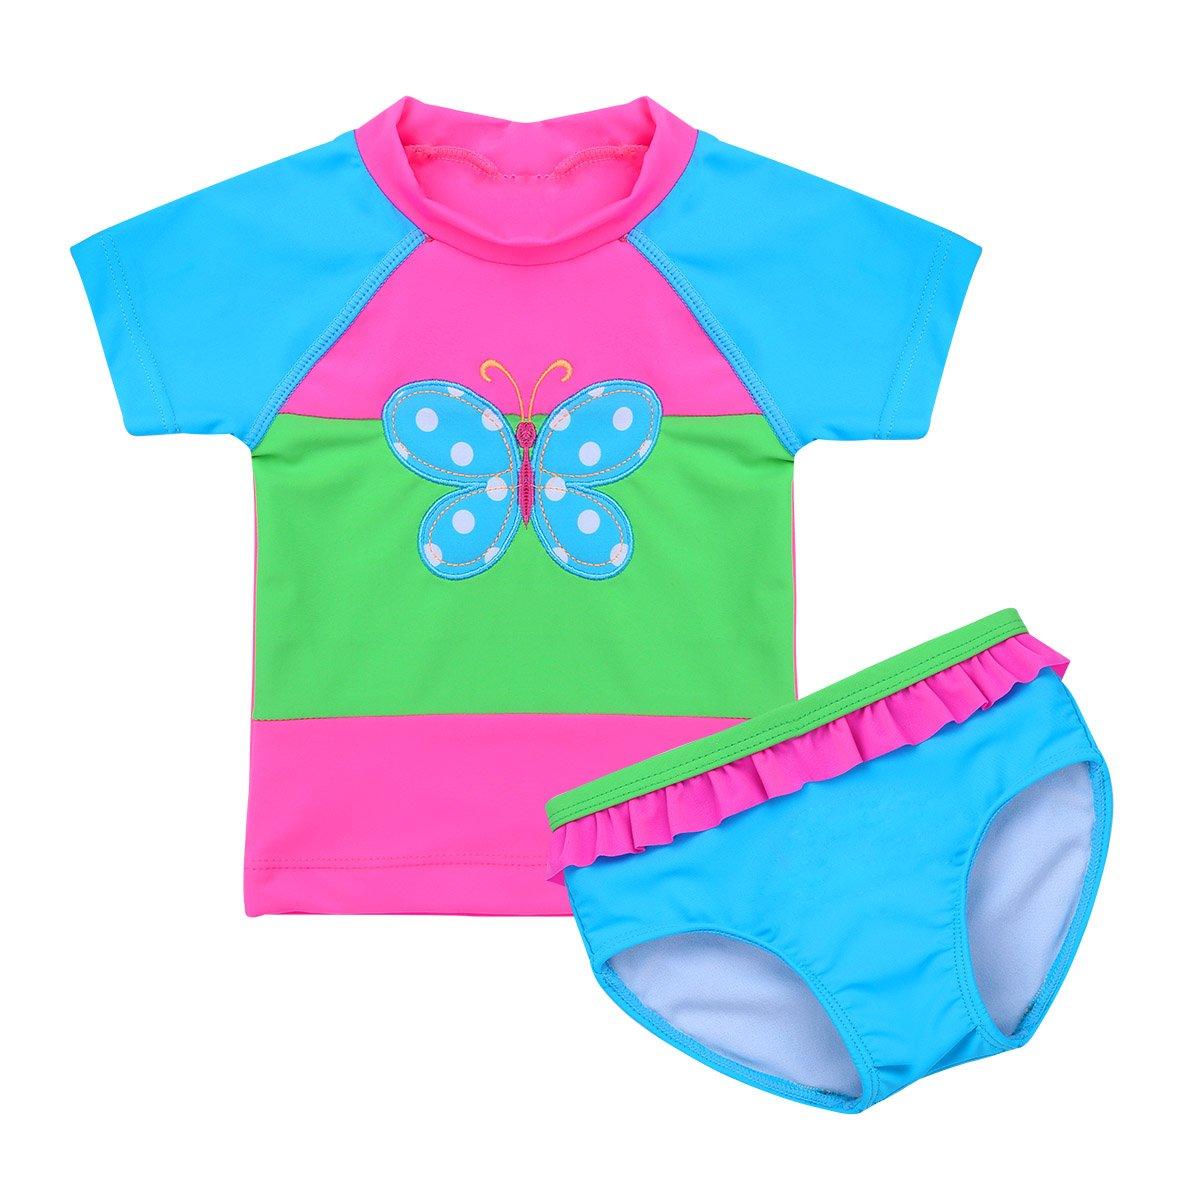 iEFiEL 2PCS Baby Girl Butterfly Swimsuit Swimwear Bathing Suit Toddler Kid Short Sleeves Rash Guard Bikini Set UPF 50+ UV